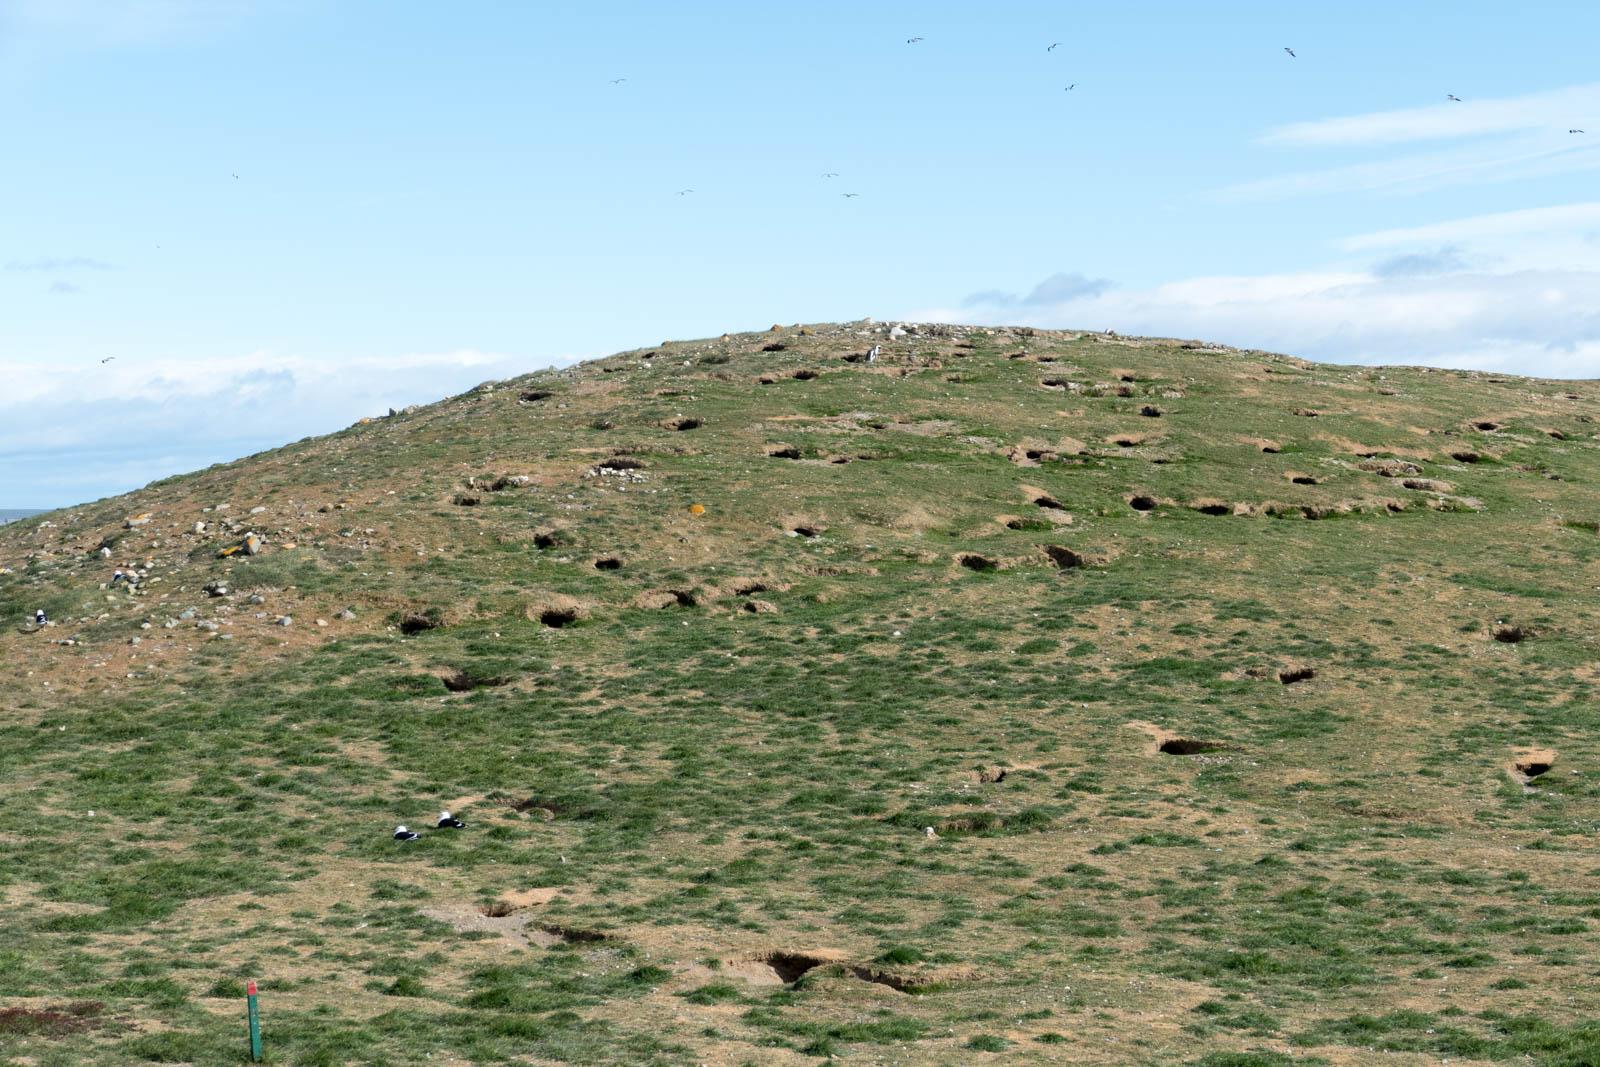 A hillside of burrows